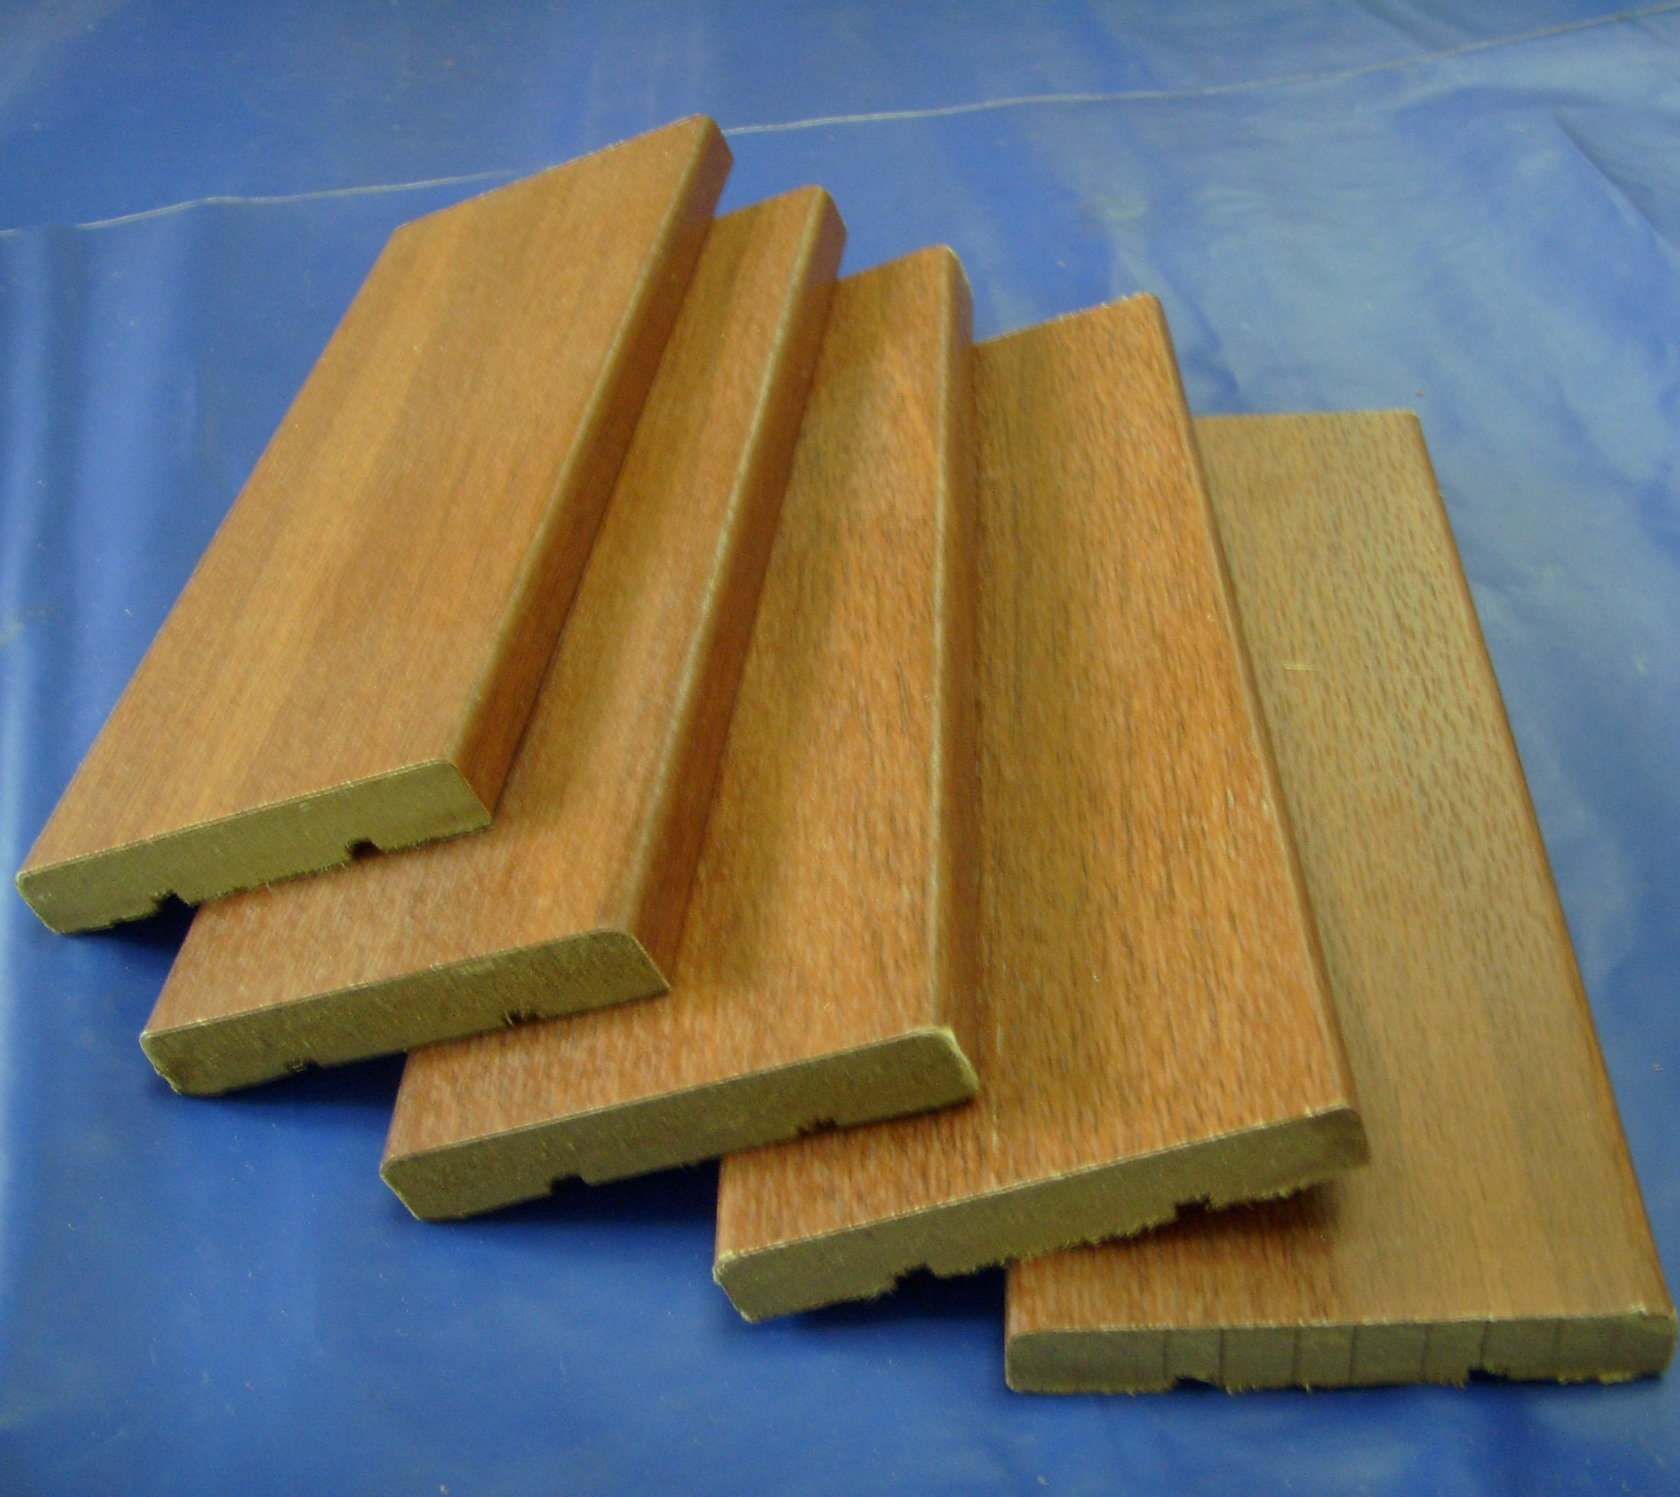 China Coated Or Laminated Or Veneed Mdf Wood Baseboard Molding China Veneed Baseboard Veneed Baseboard Moulding